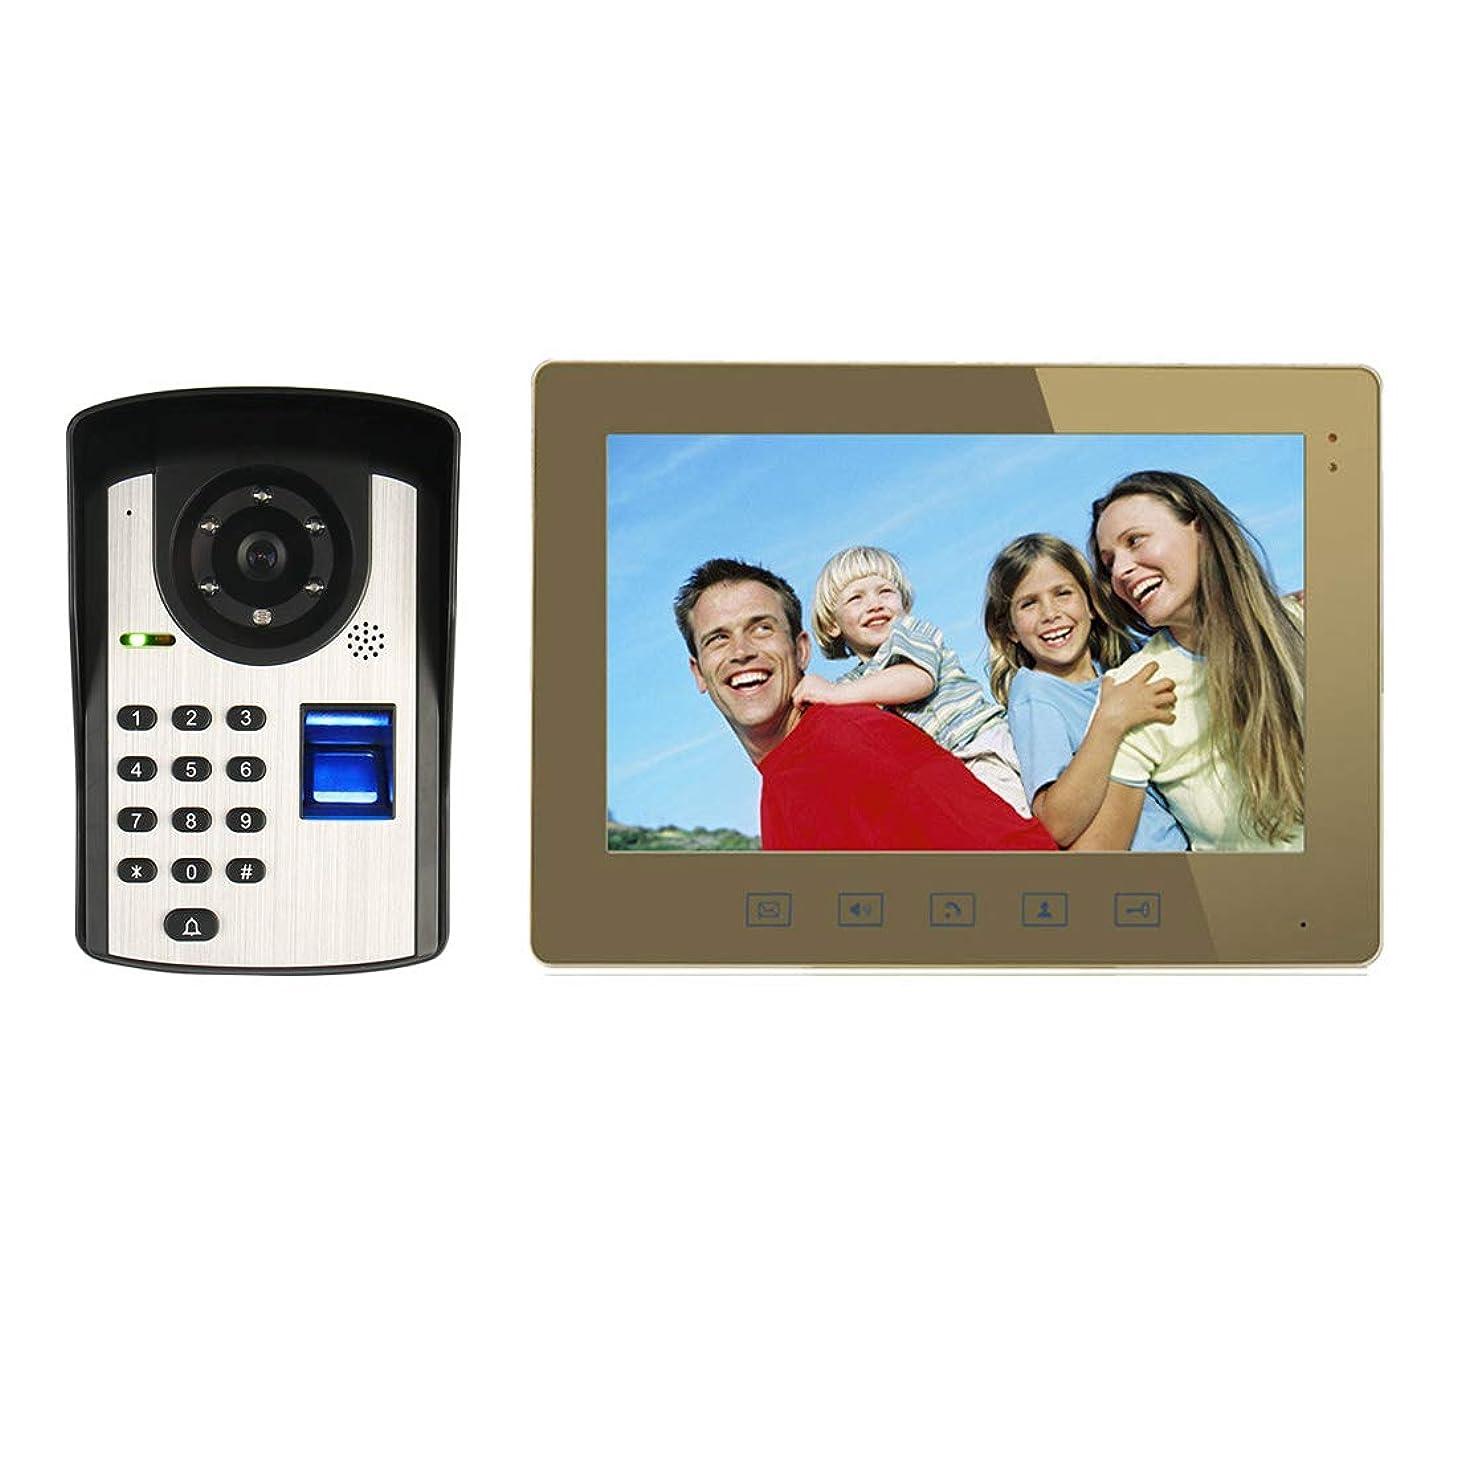 JINPENGPEN 10 inch Video doorbell Telephone intercom System Fingerprint Recognition Remote Unlock Night Vision Function Home Monitoring